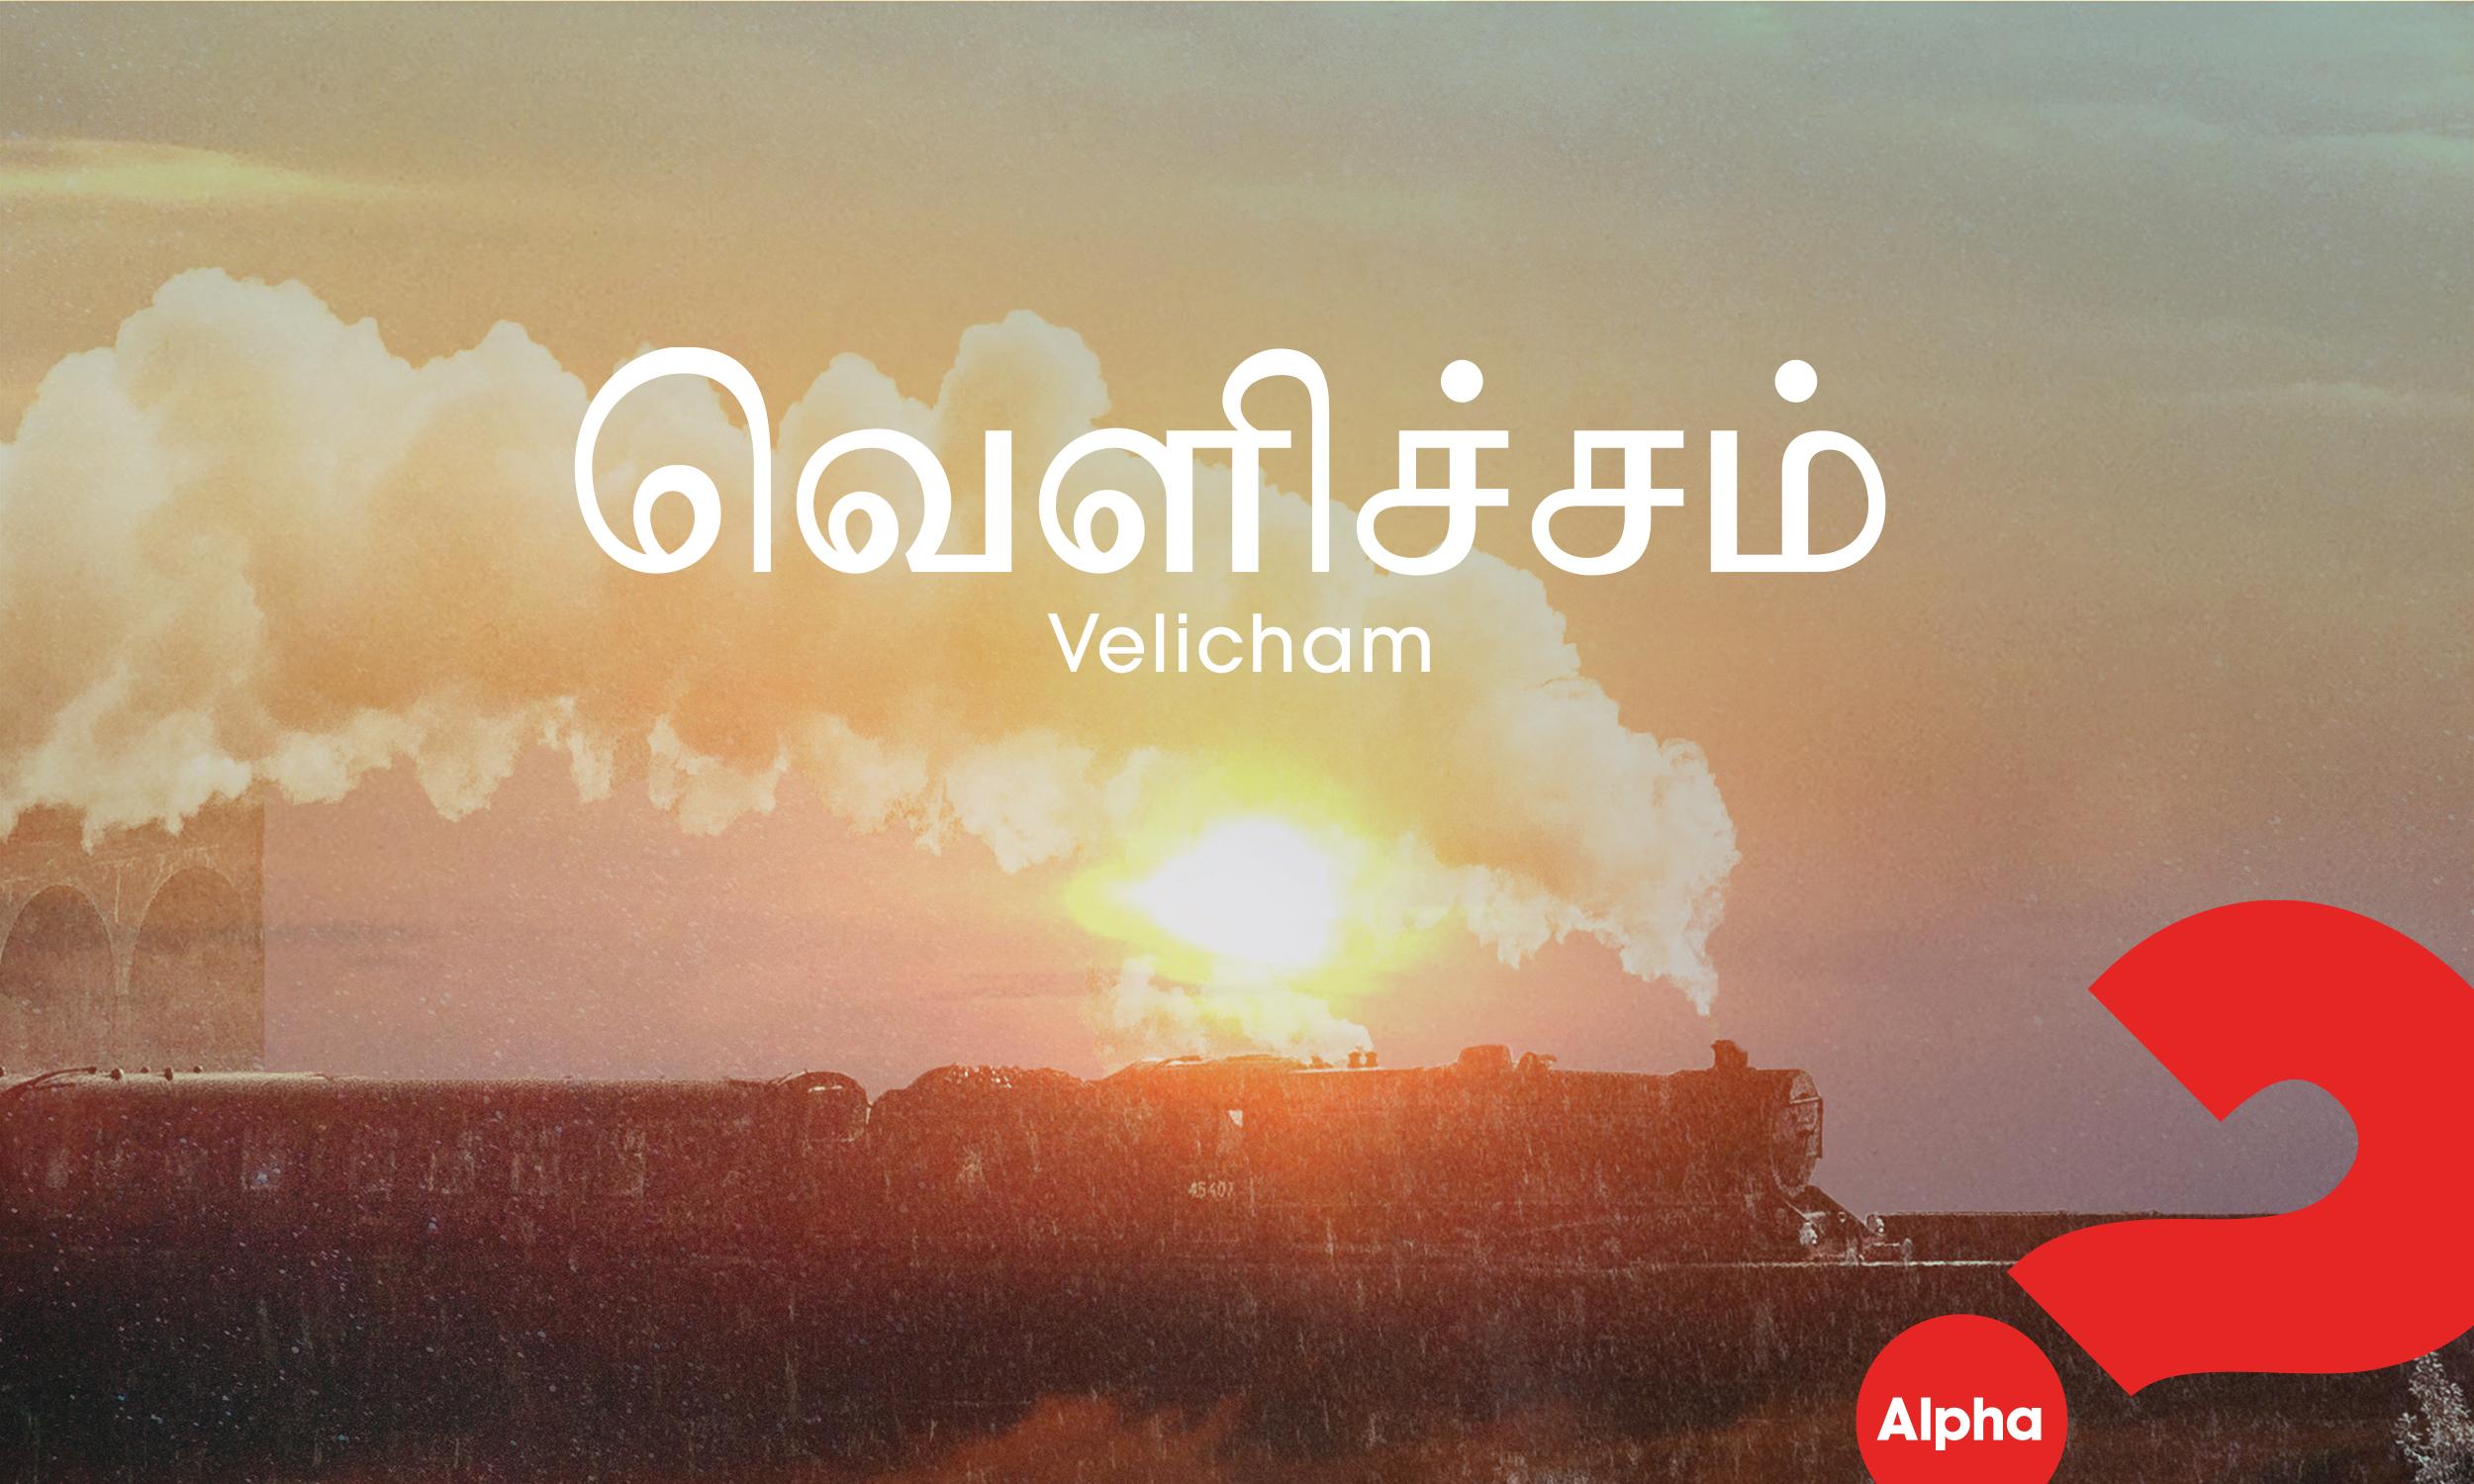 Velicham